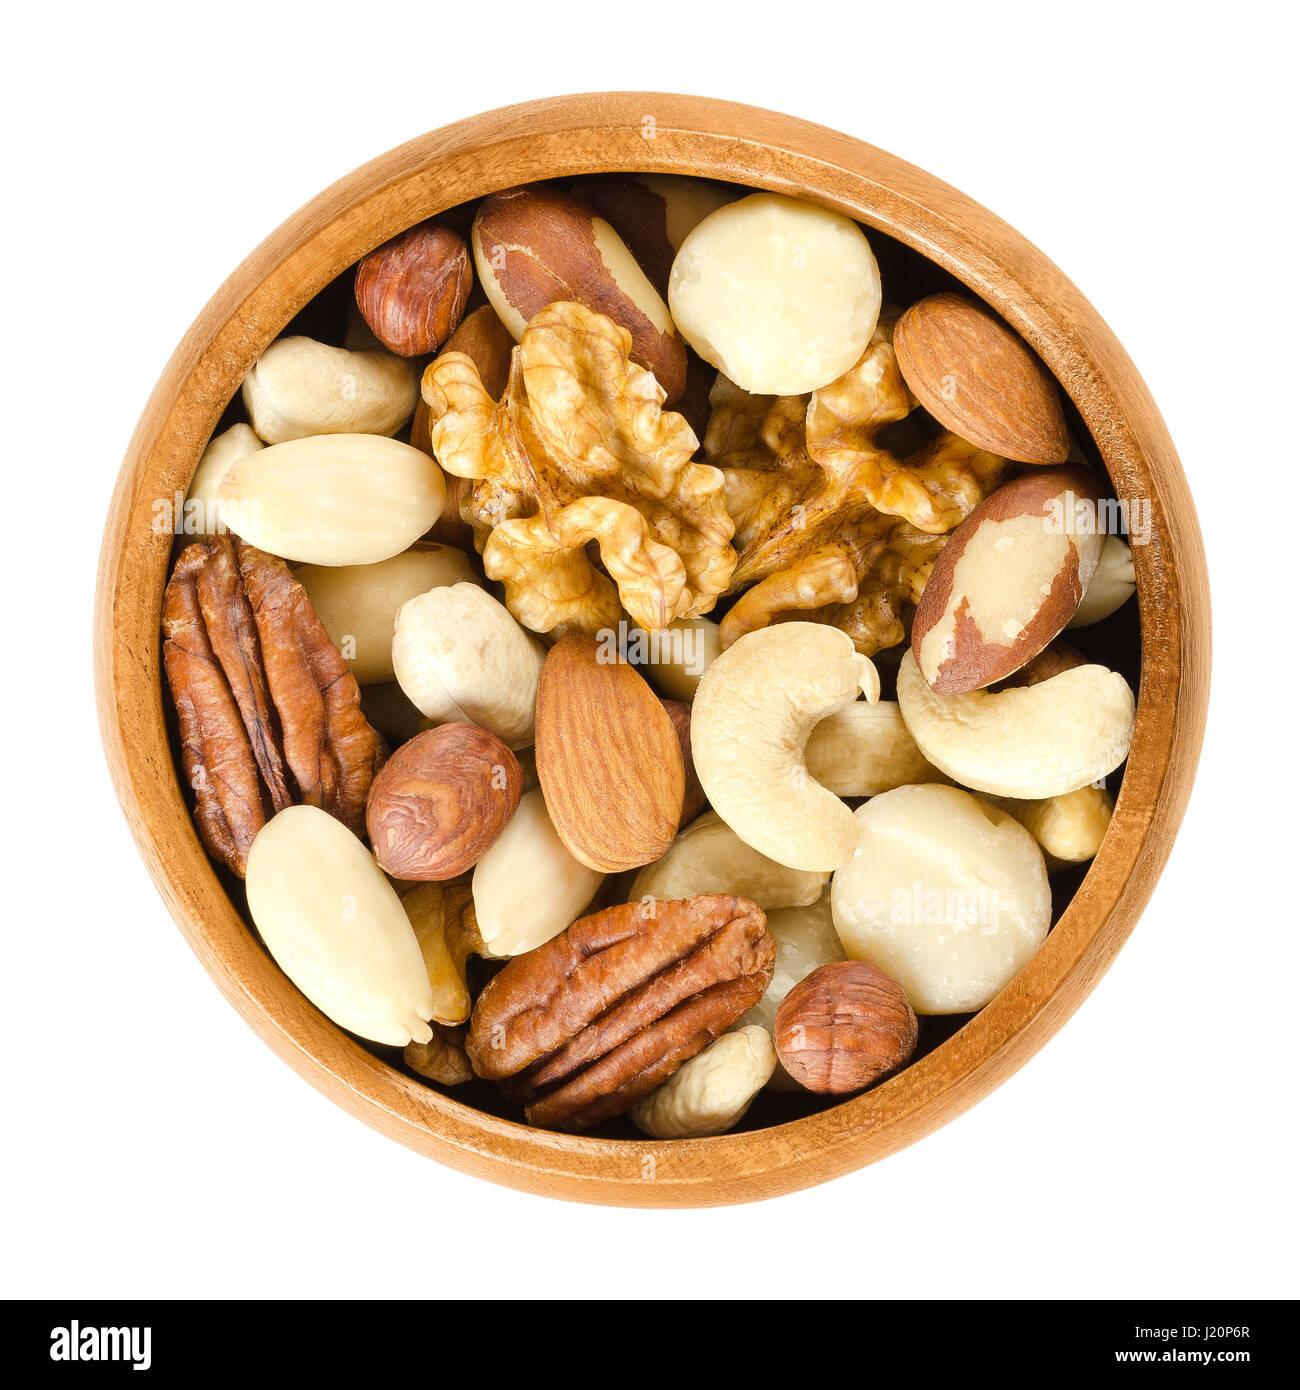 Raw mixed nuts in wooden bowl. Dried walnuts, hazelnuts, almonds, cashews, macadamia, Brazil and pecan nuts. Fancy Stock Photo